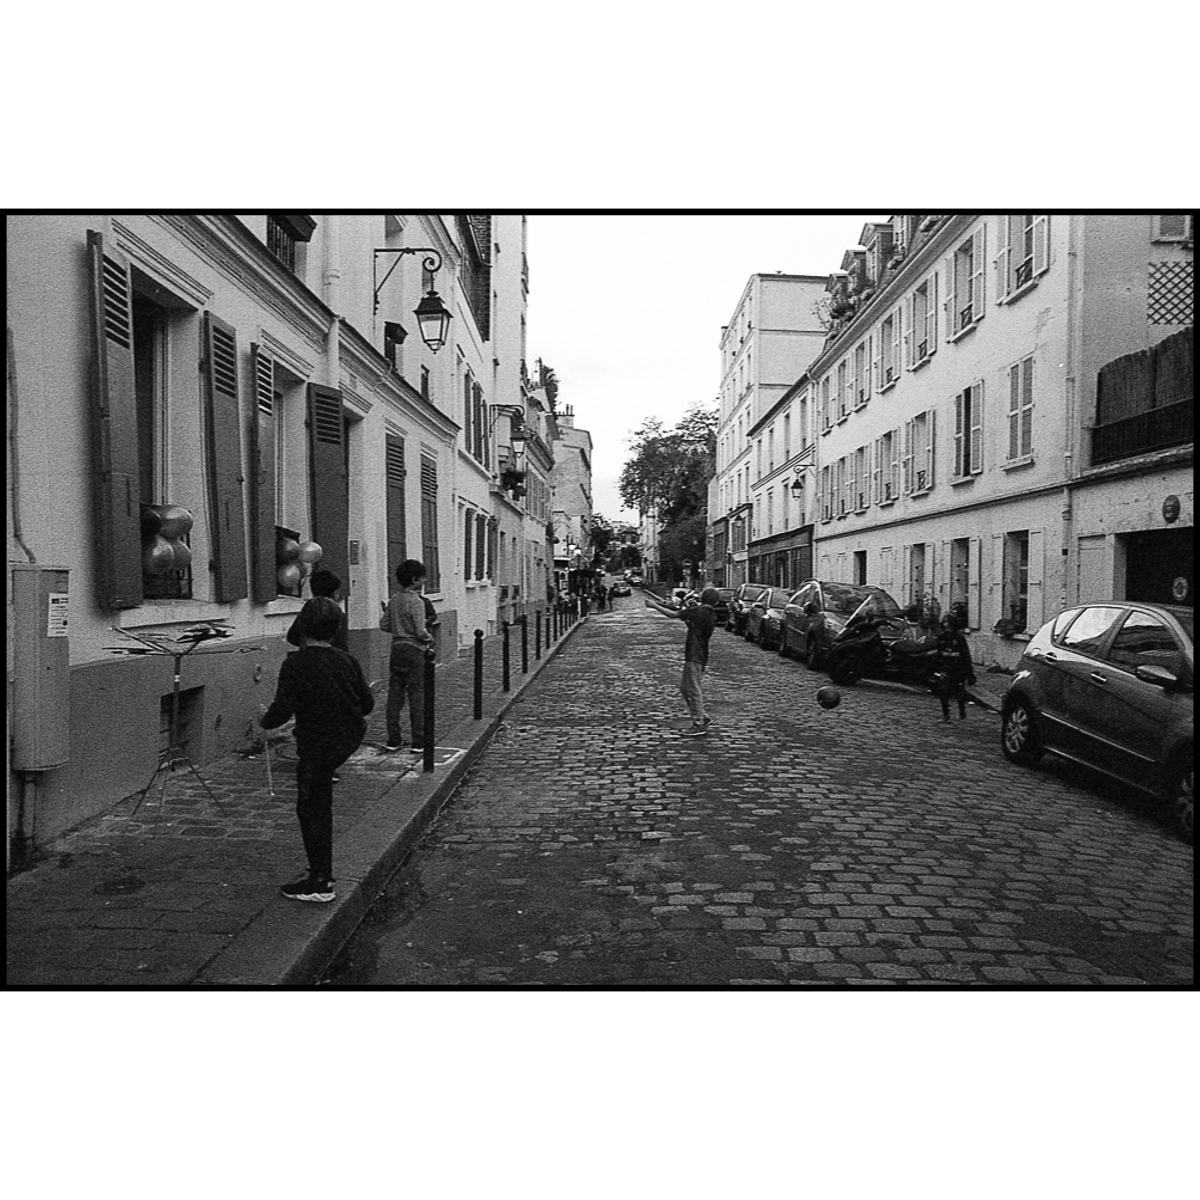 paris file-051.jpg